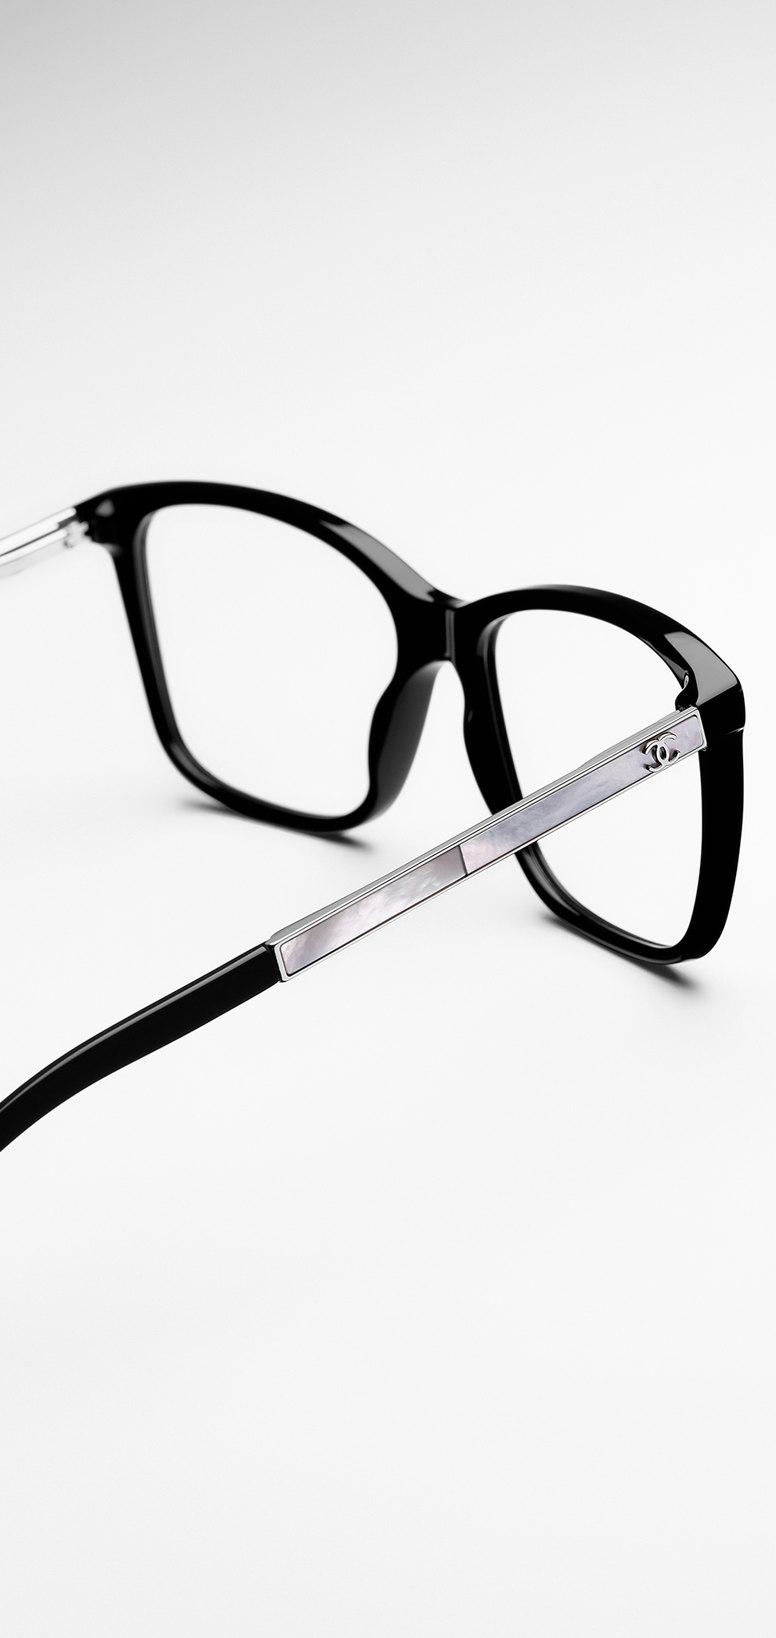 Chanel Spectacle Frames Uk   Frameswalls.org